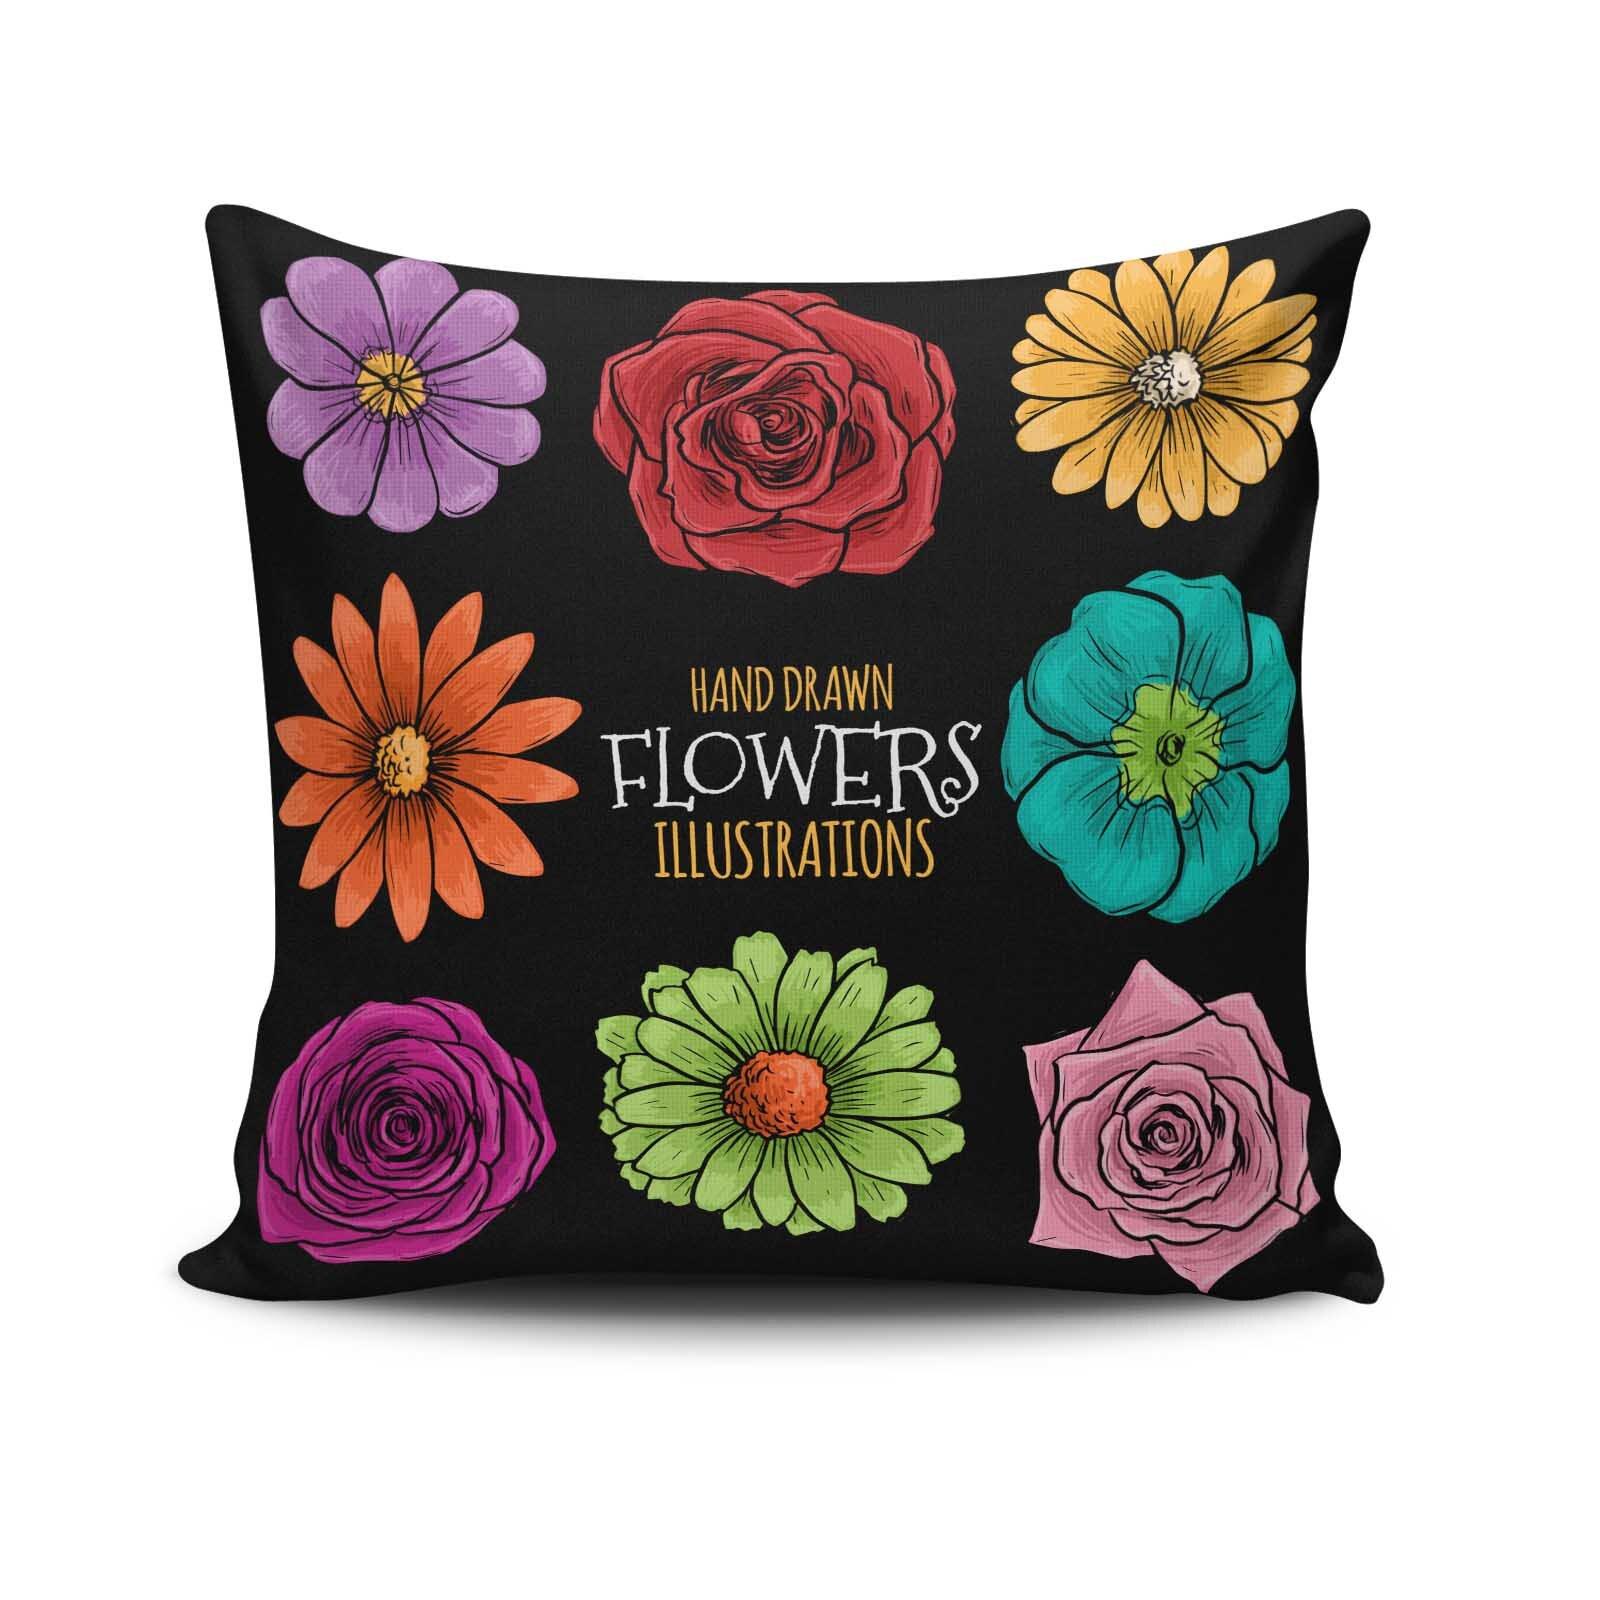 Perna decorativa Cushion Love, Dimensiune: 45 x 45 cm, Material exterior: 50% bumbac / 50% poliester 768CLV0216